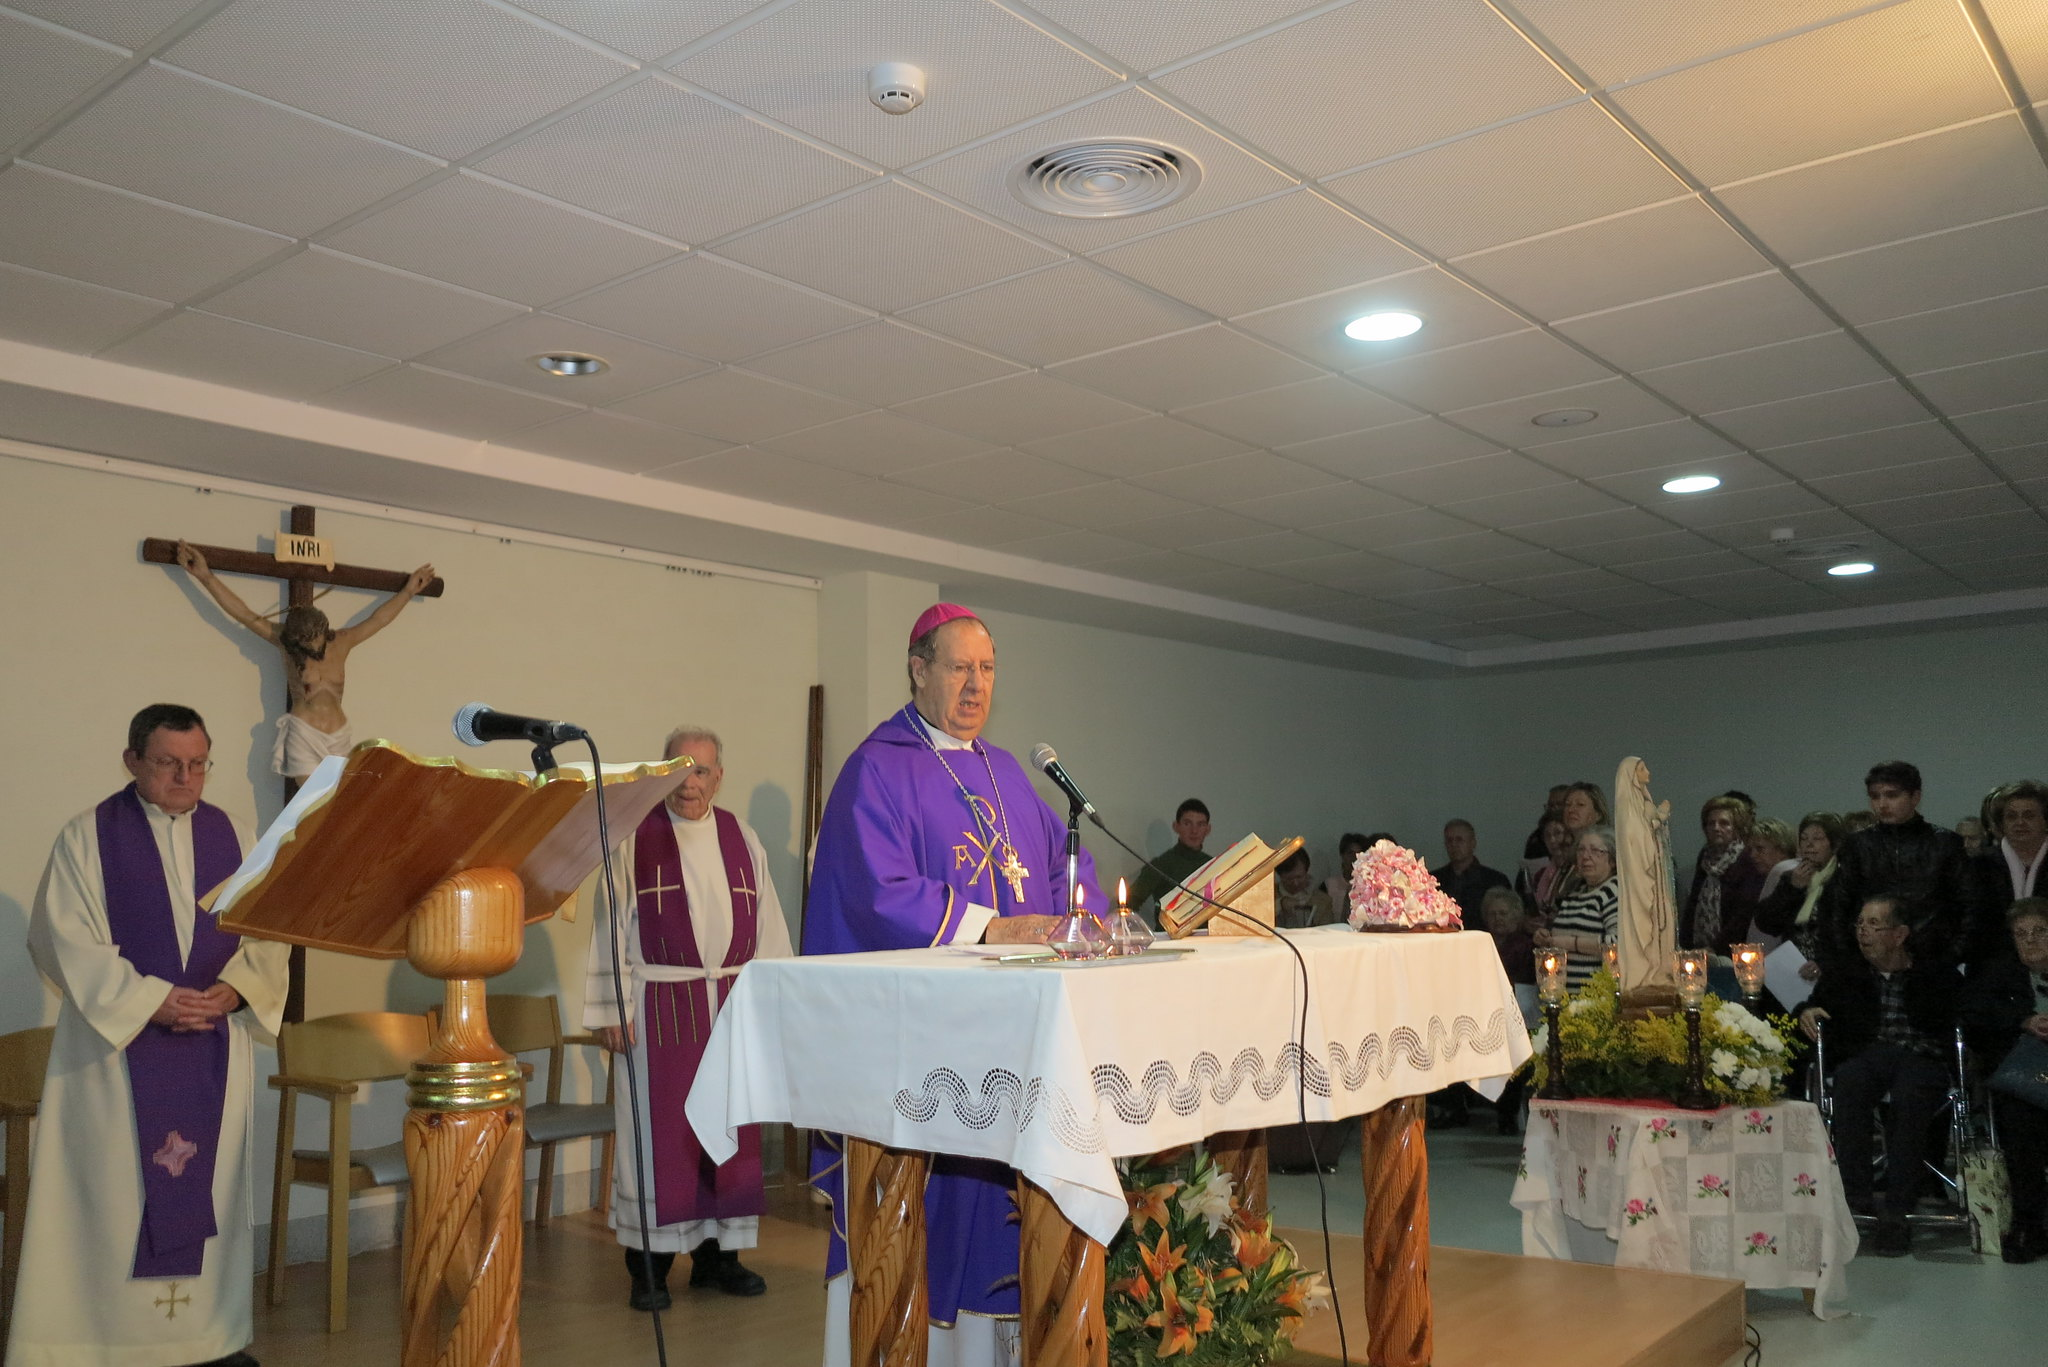 (2016-02-13) - Inauguración Virgen de Lourdes, La Molineta - Archivo La Molineta 2 (09)